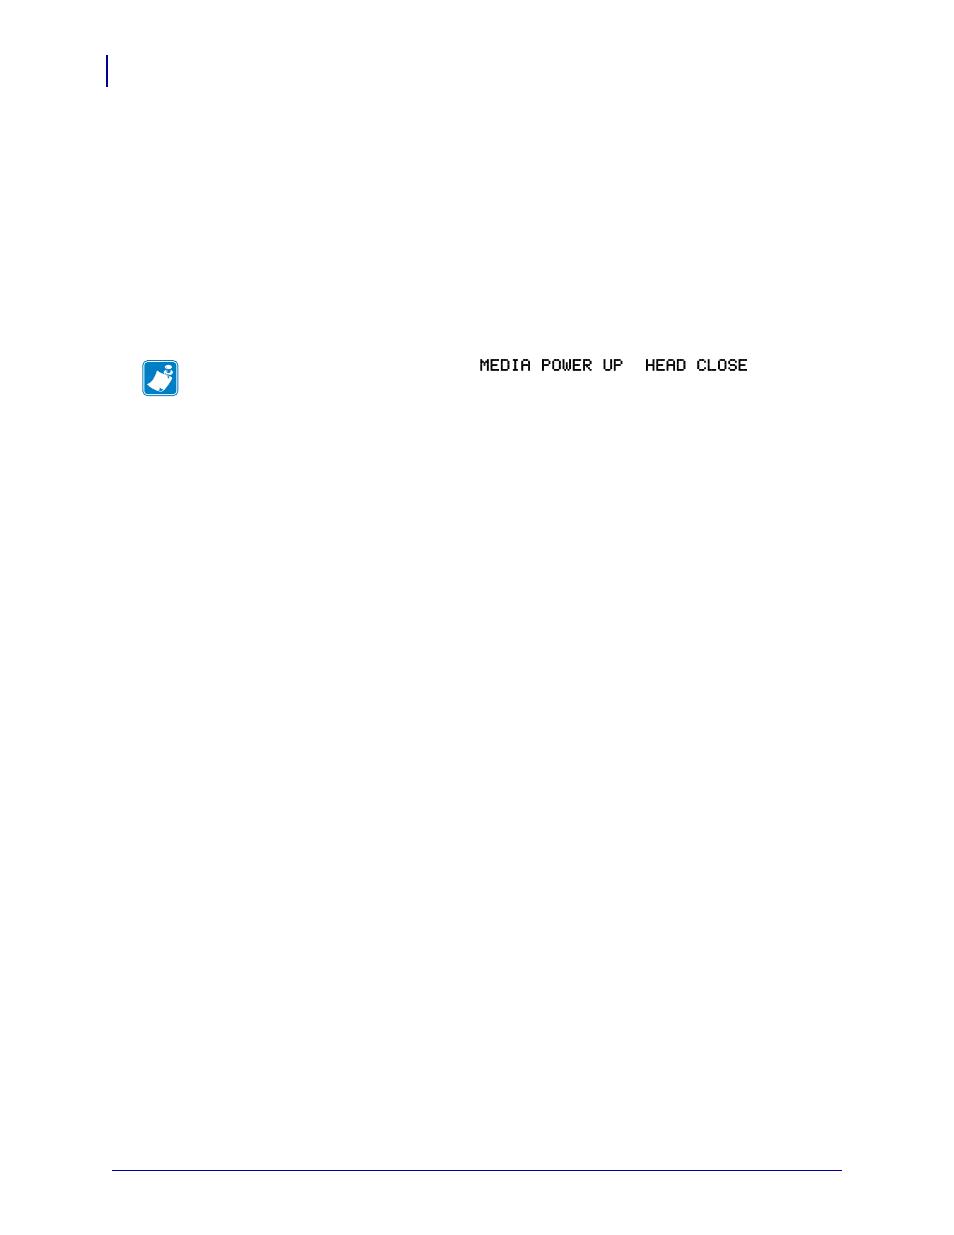 Calibrate the printer, Auto calibration, Manual calibration | Zebra